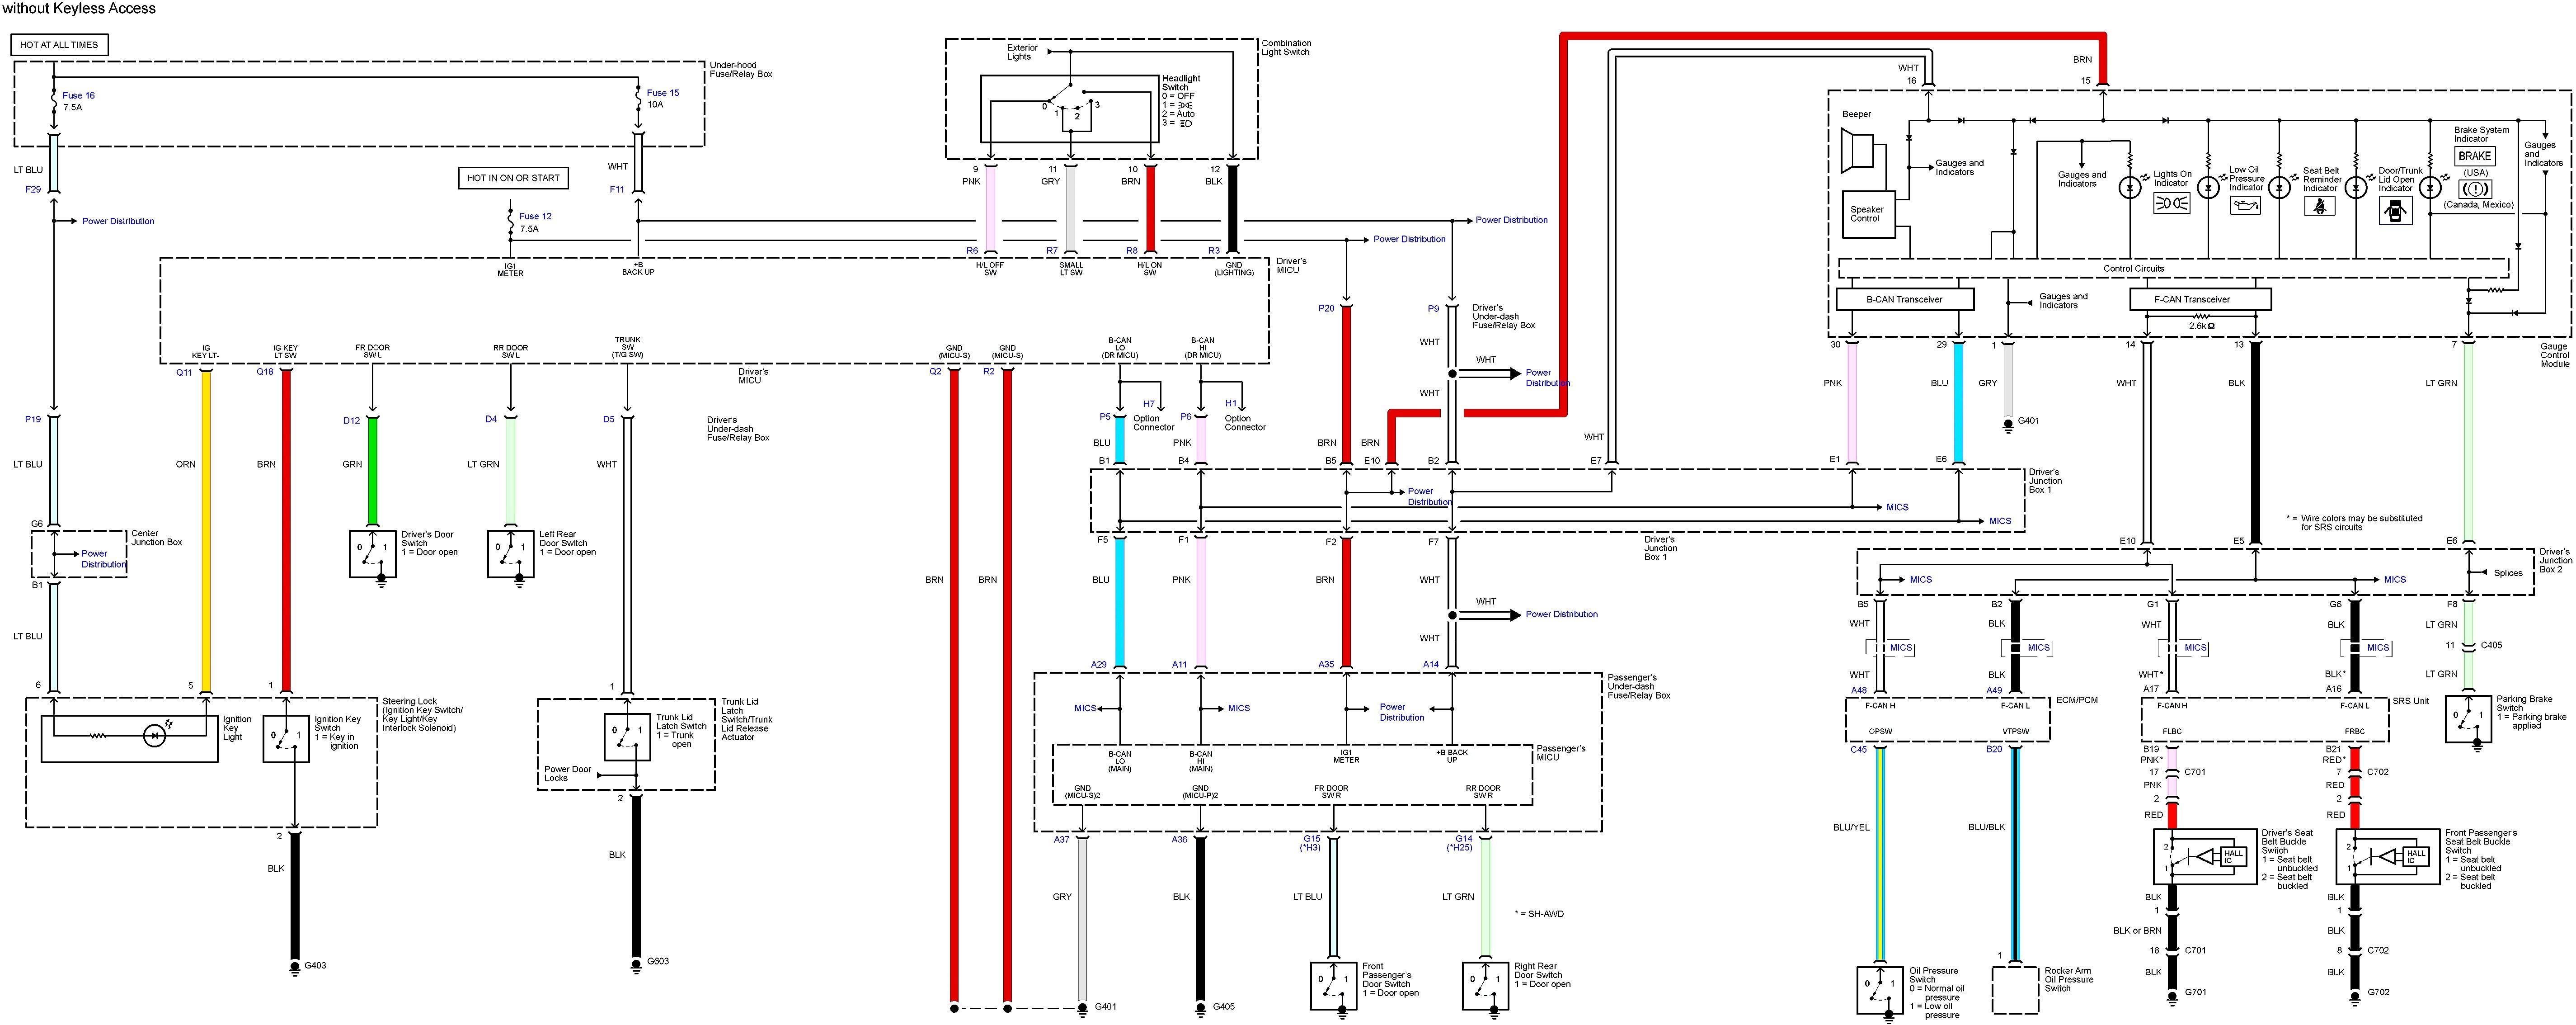 Acura Integra Engine Diagram Acura Tl 2013 – 2014 – Wiring Diagrams – Key Warning – Carknowledge Of Acura Integra Engine Diagram